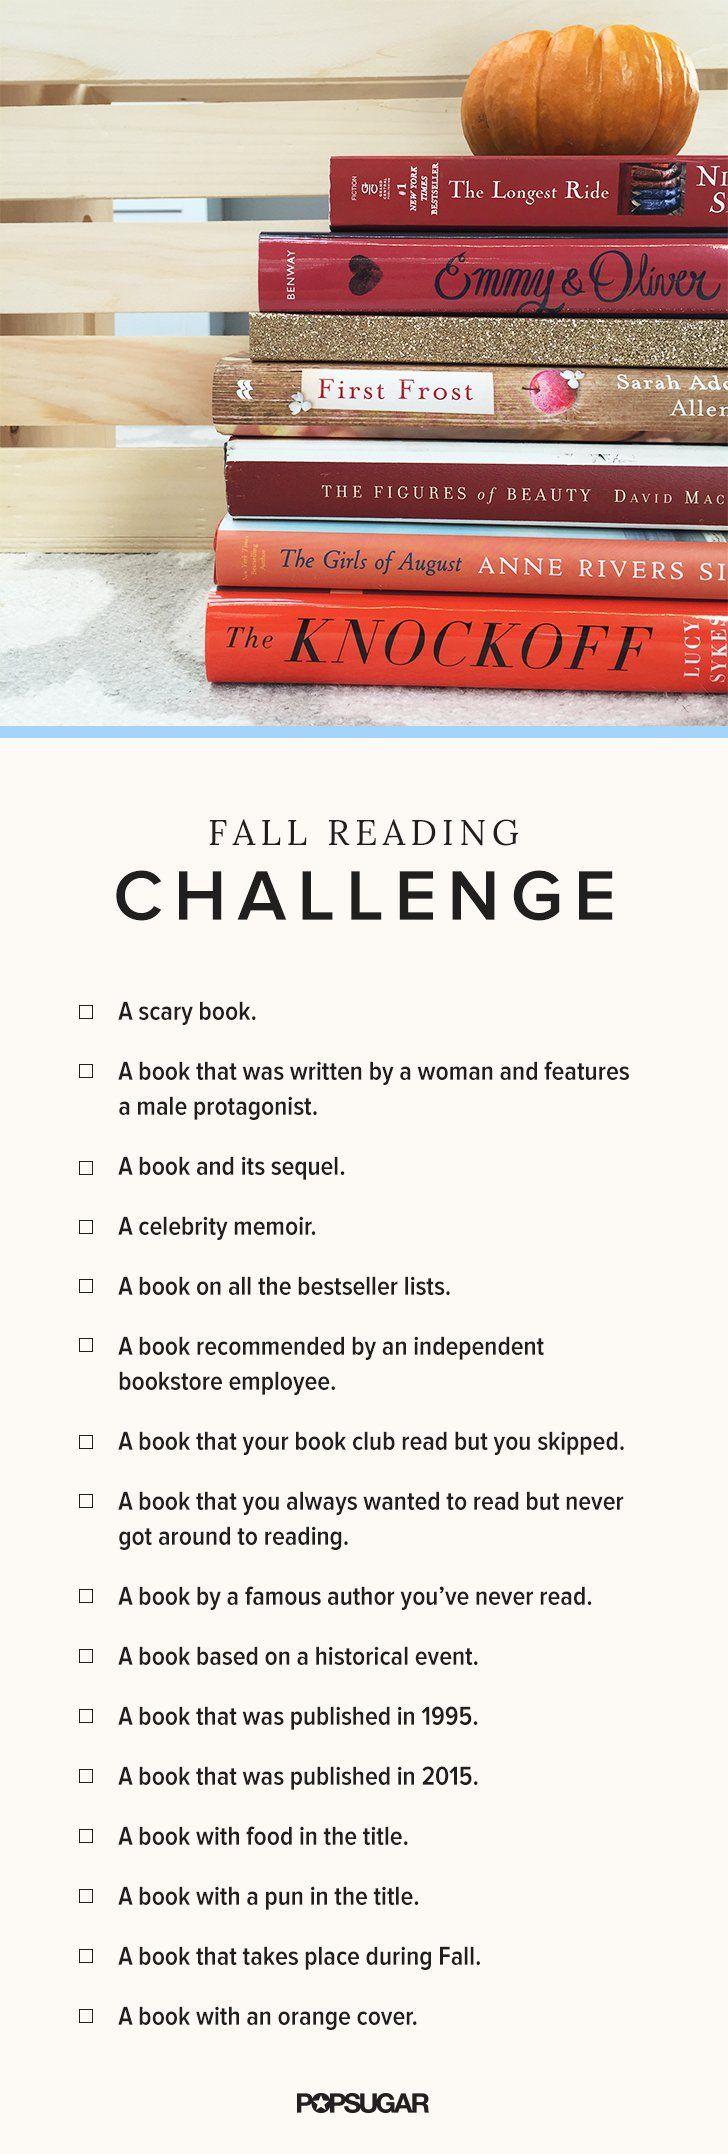 Fall Reading Challenge #Books #Reading #GoodBooks #ECU #JoynerLibrary #Challenge